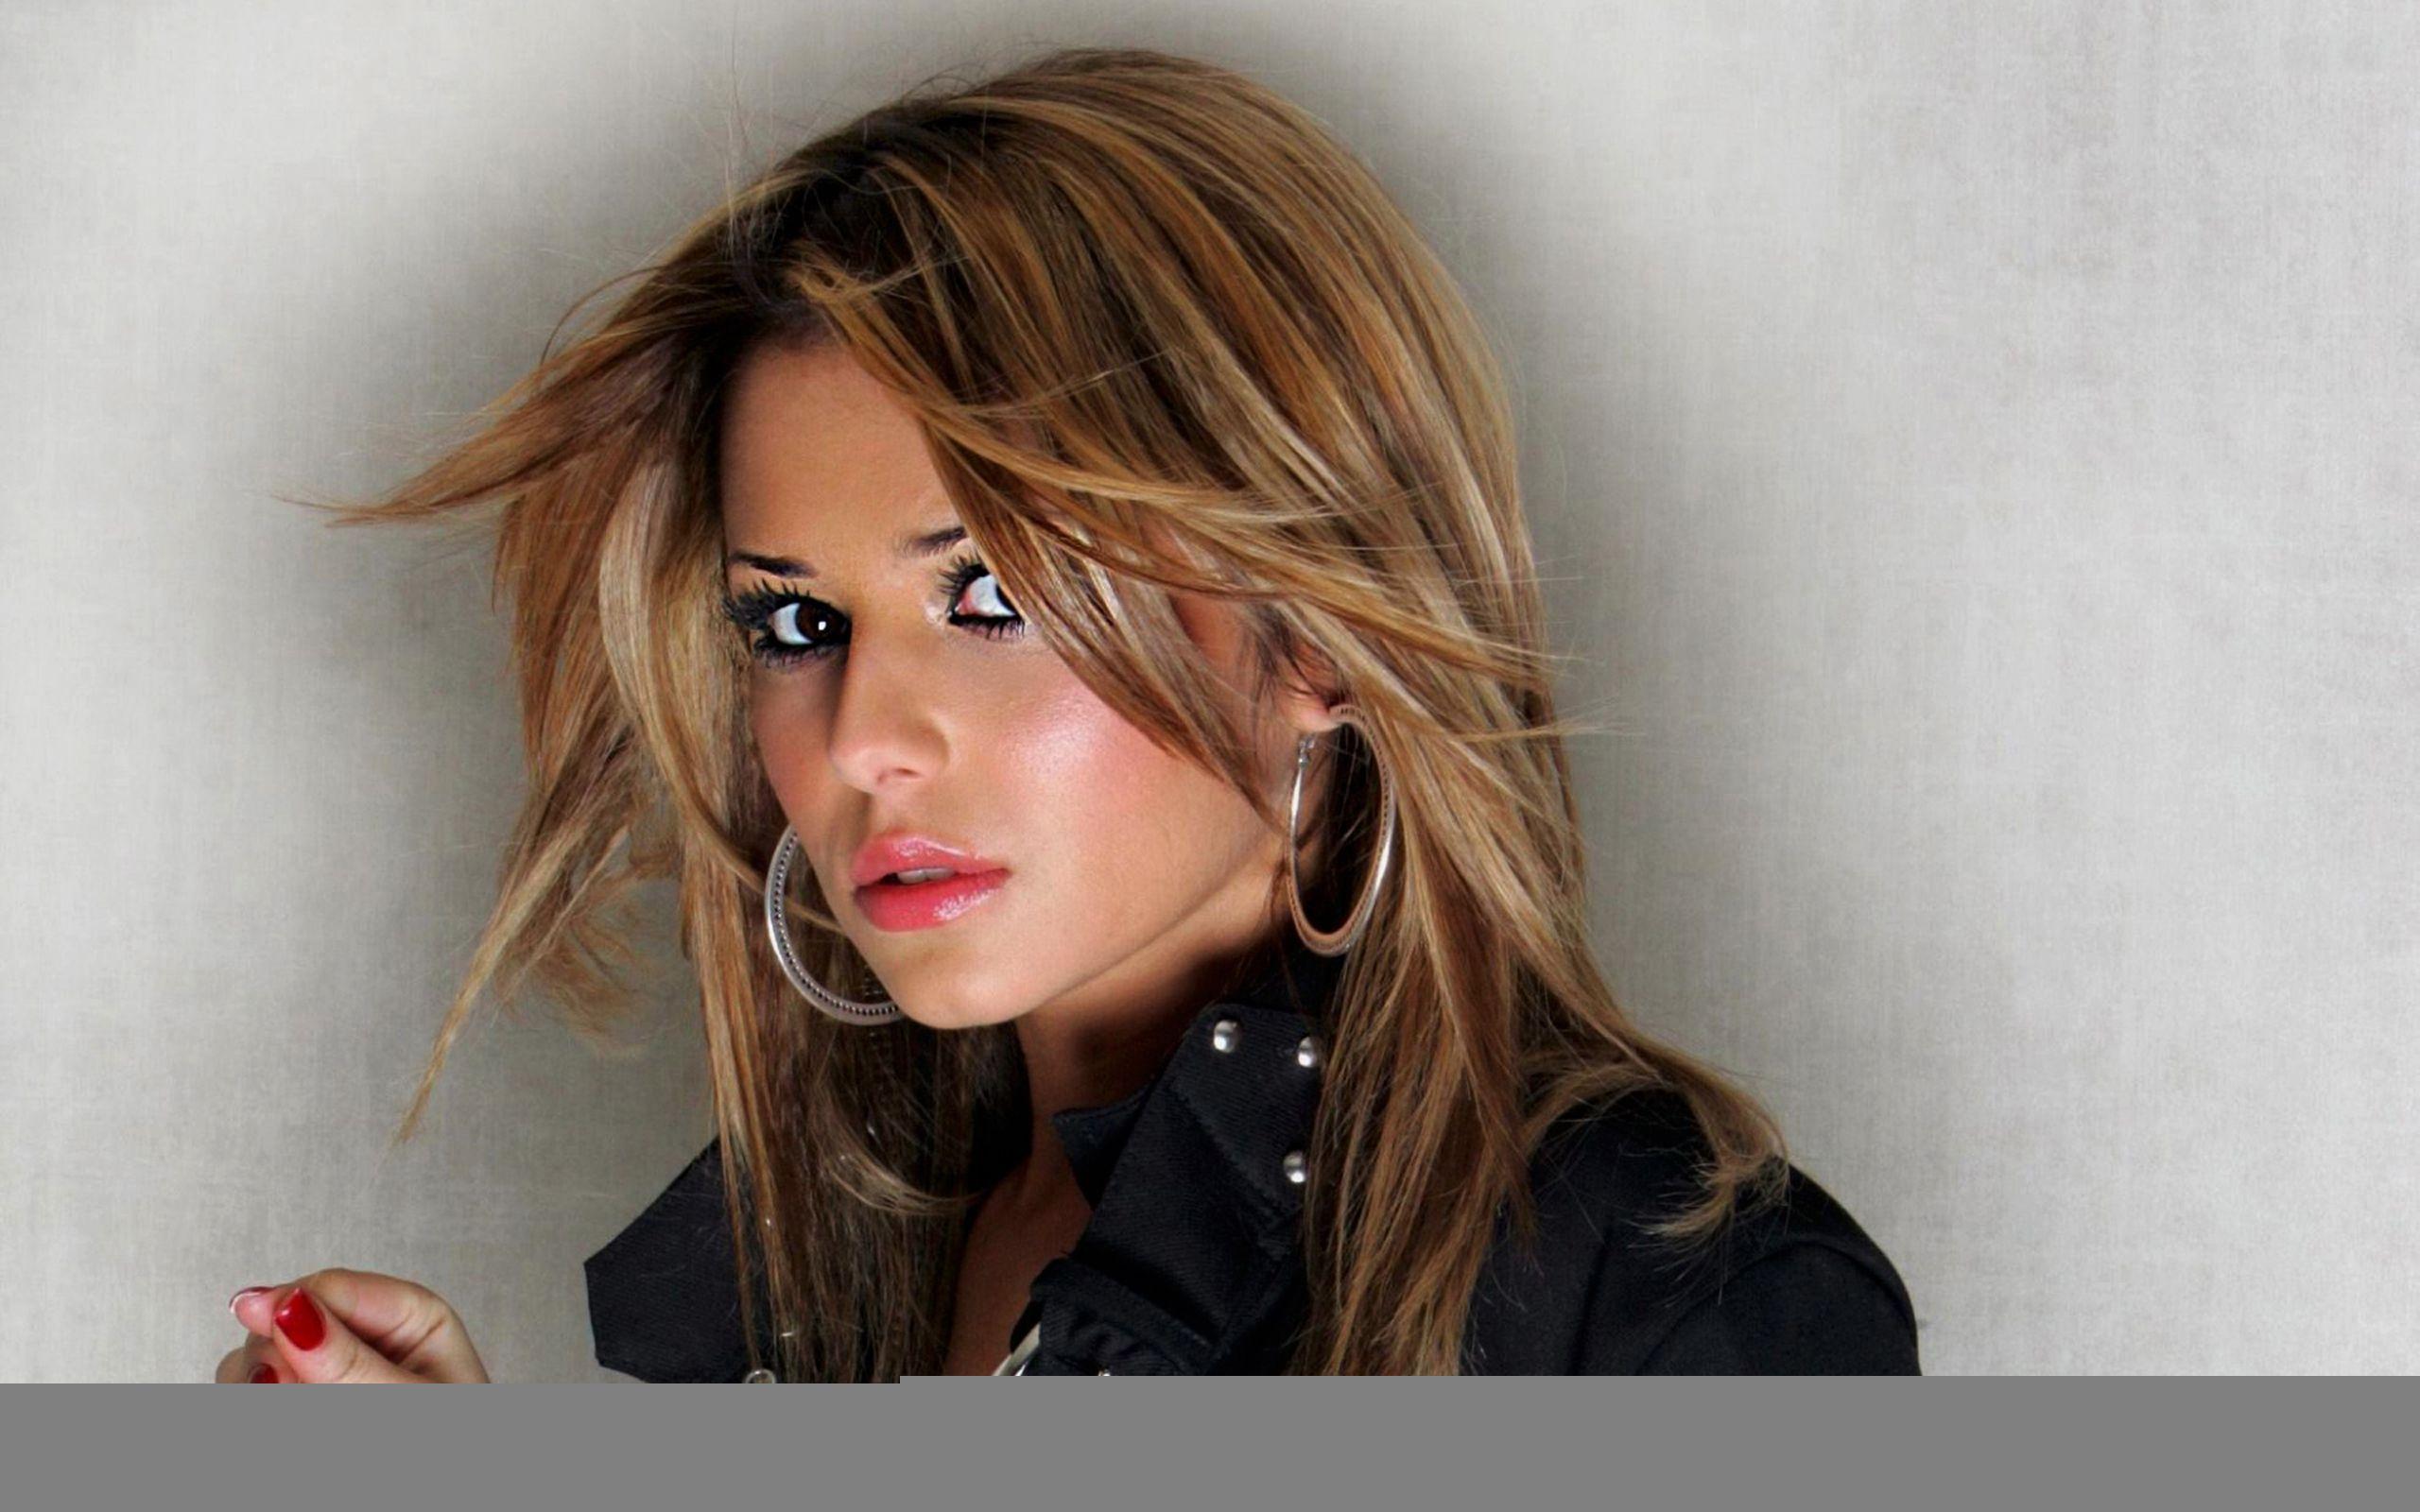 Cheryl Cole Hd Wallpaper 1080pstar Hd Wallpapersgirls 234141 2560x1600